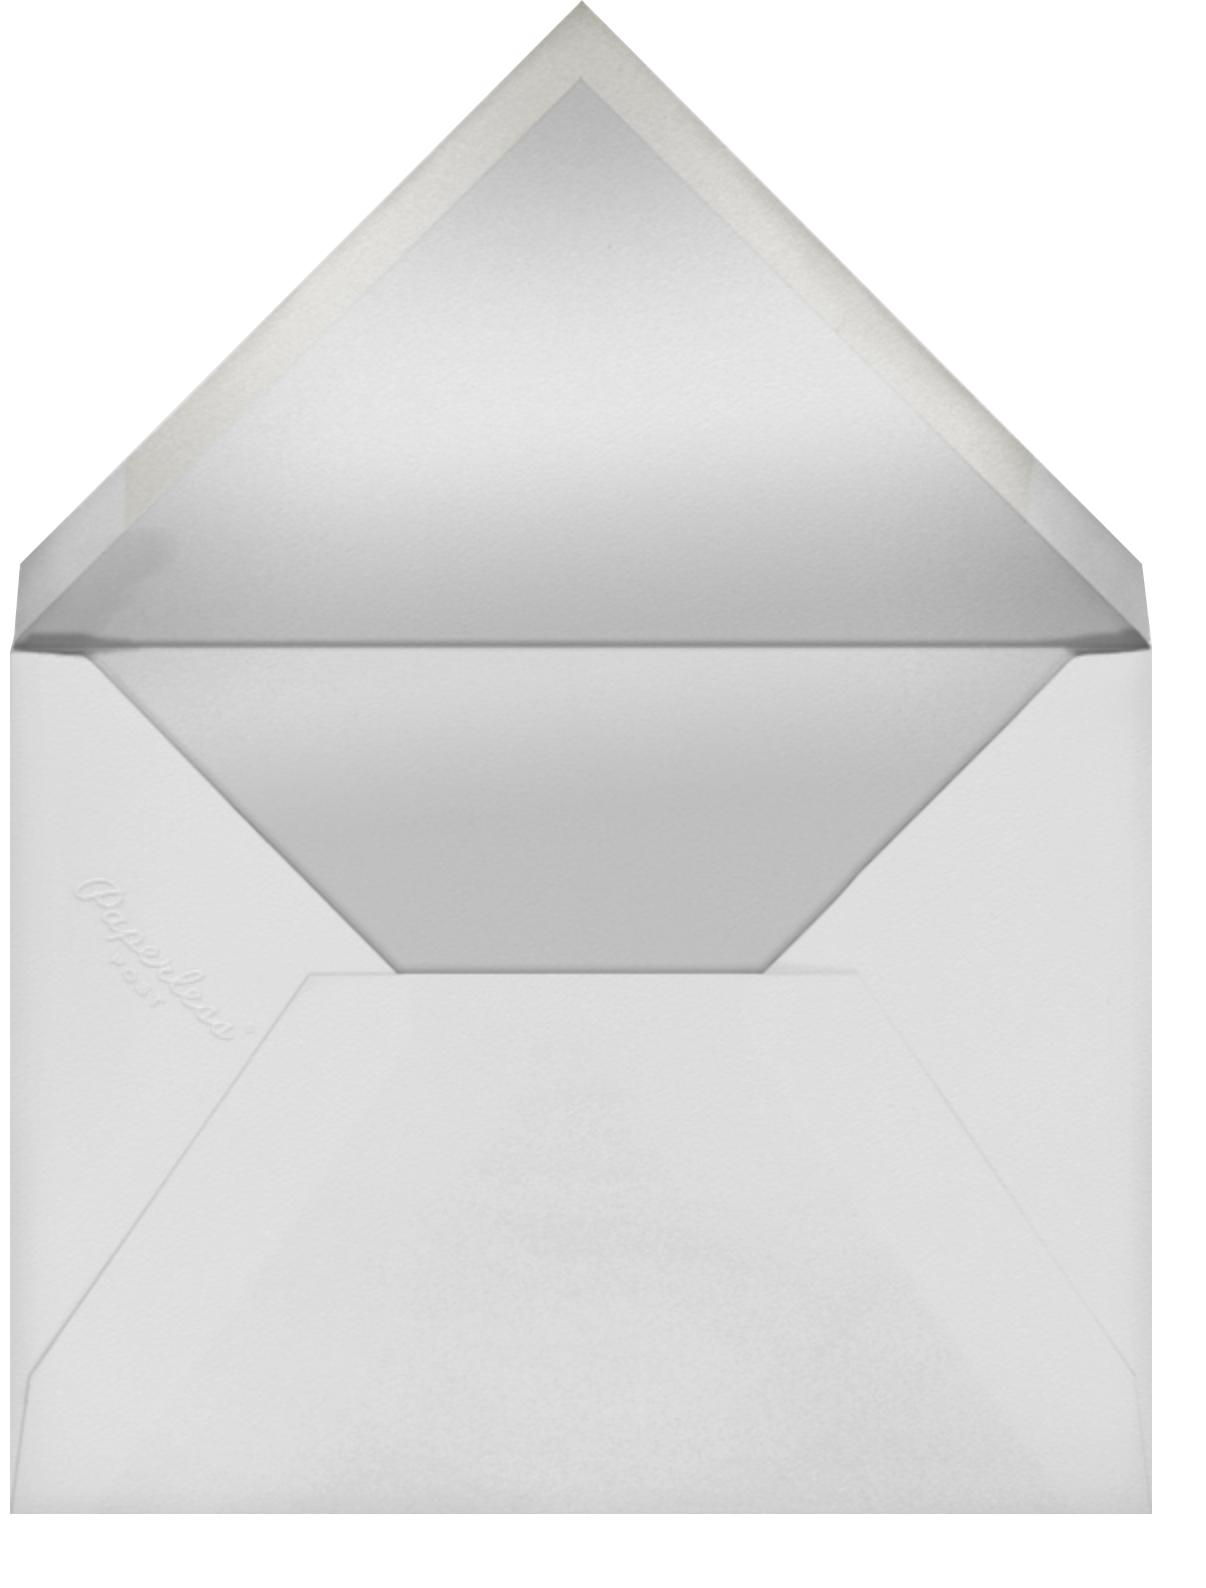 Sonoma (Menu) - Chinchilla  - Linda and Harriett - Menus - envelope back